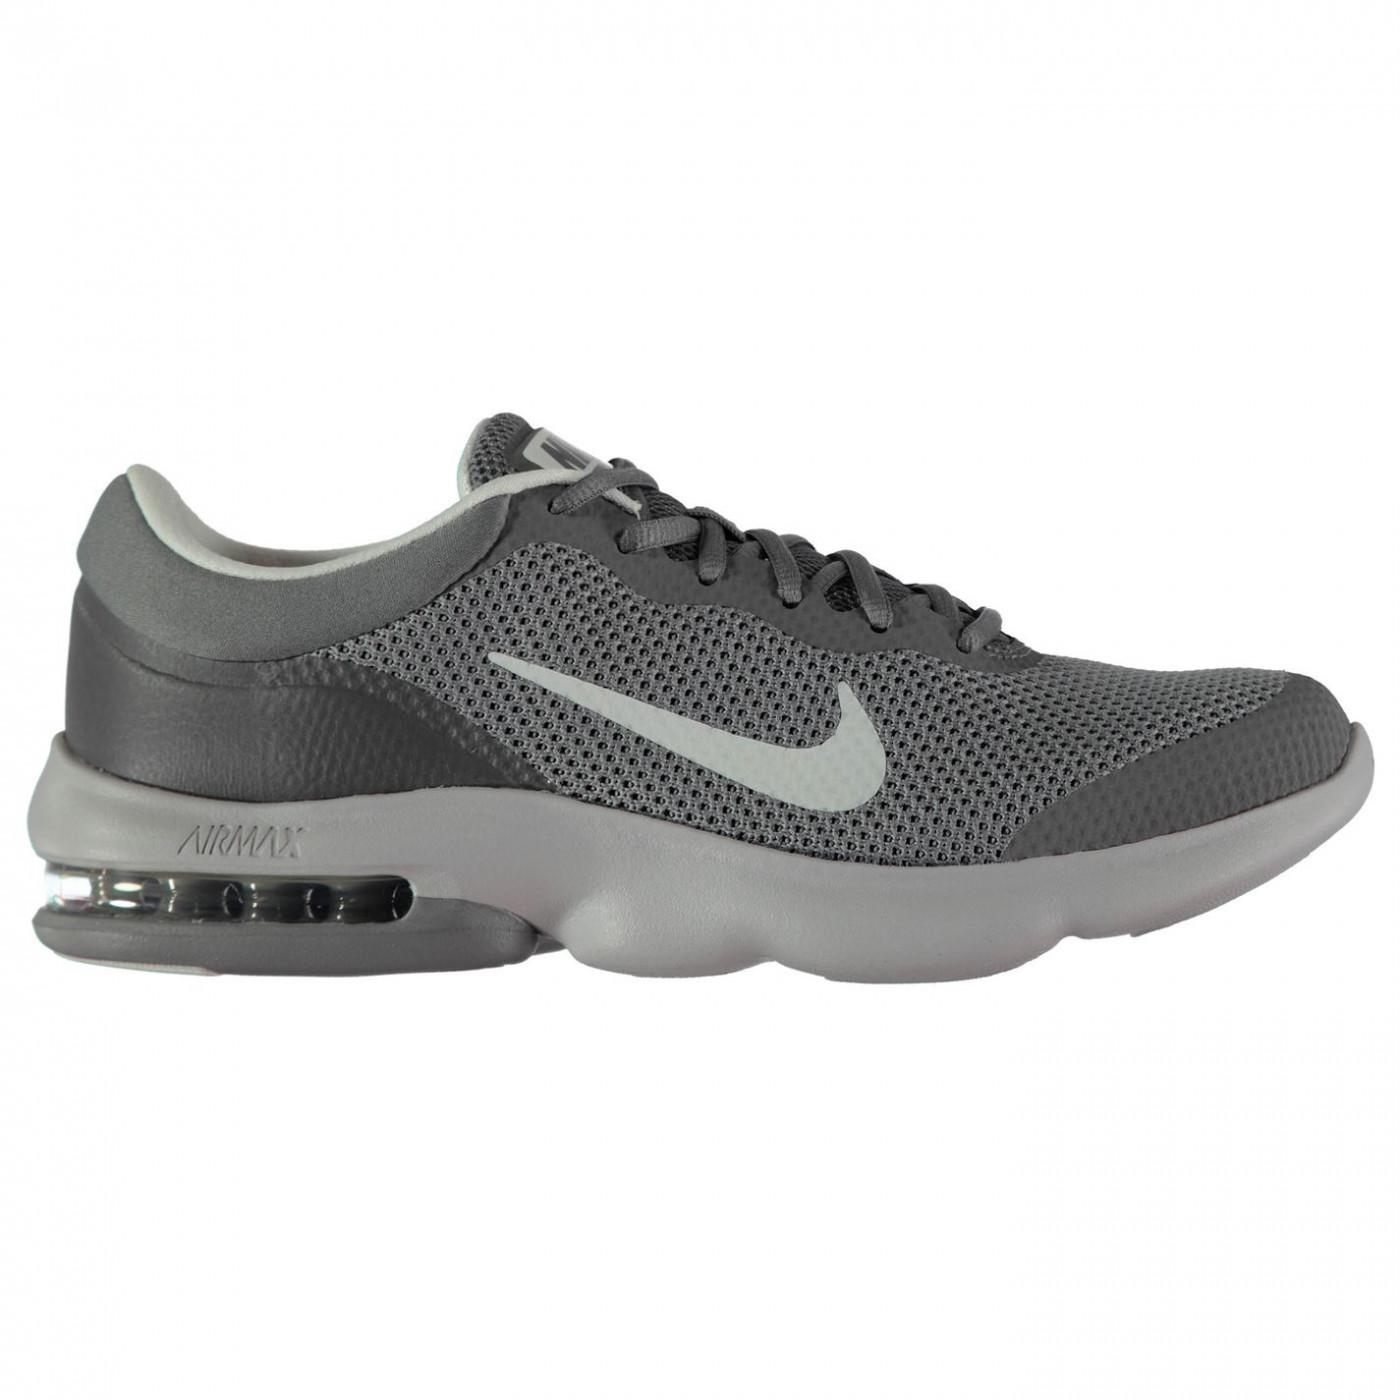 Ombre Free Advantage Trainers, Nike | Sneakers nike, Nike